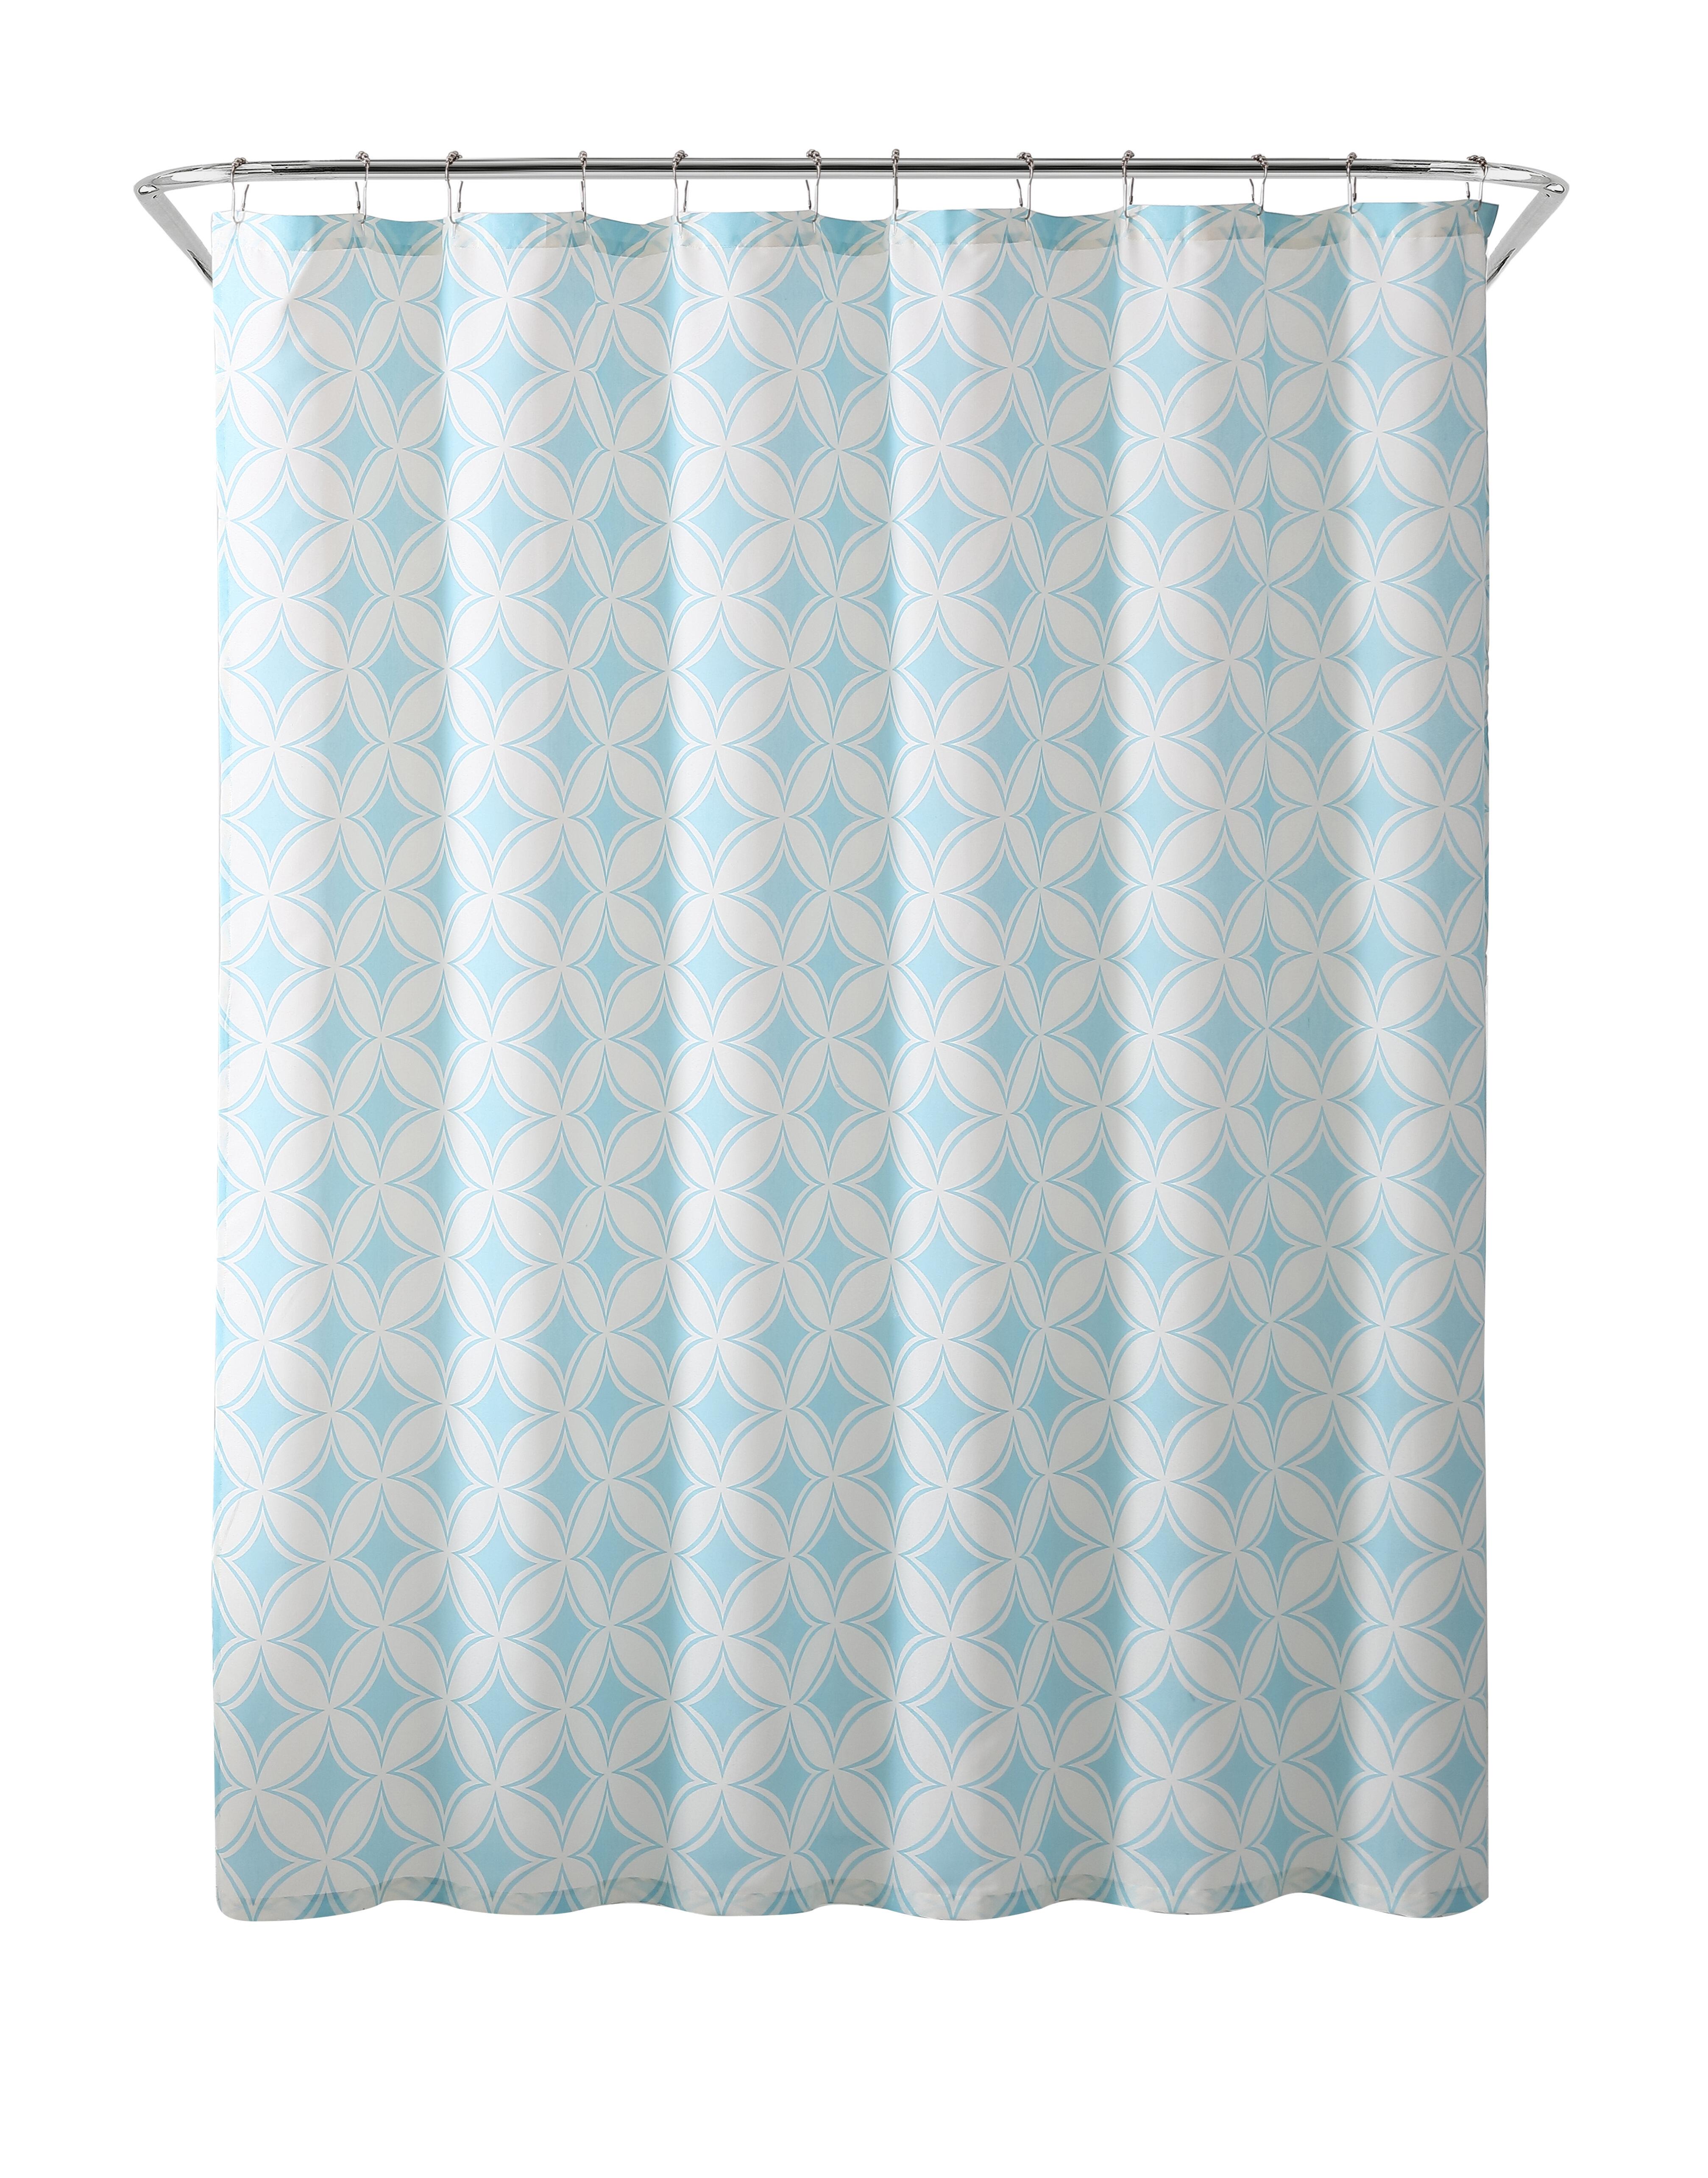 72x72 Luxury Blue Botanical Floral Cotton Printed Fabric